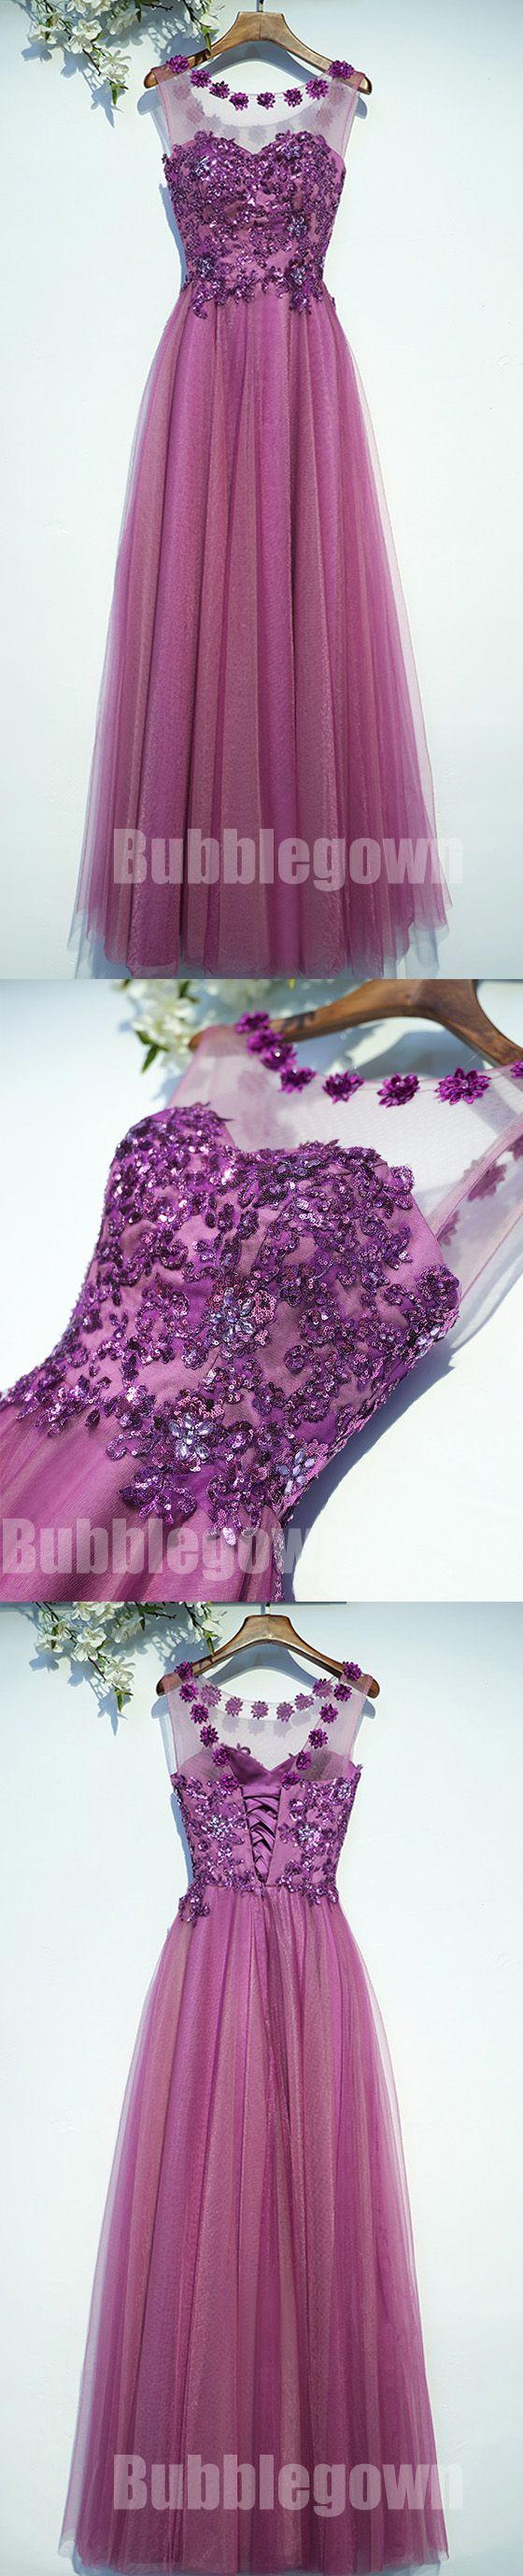 New Arrival Formal Cheap Elegant Lace Up Back Long Prom Dresses, BGP026 #promdress #longpromdress